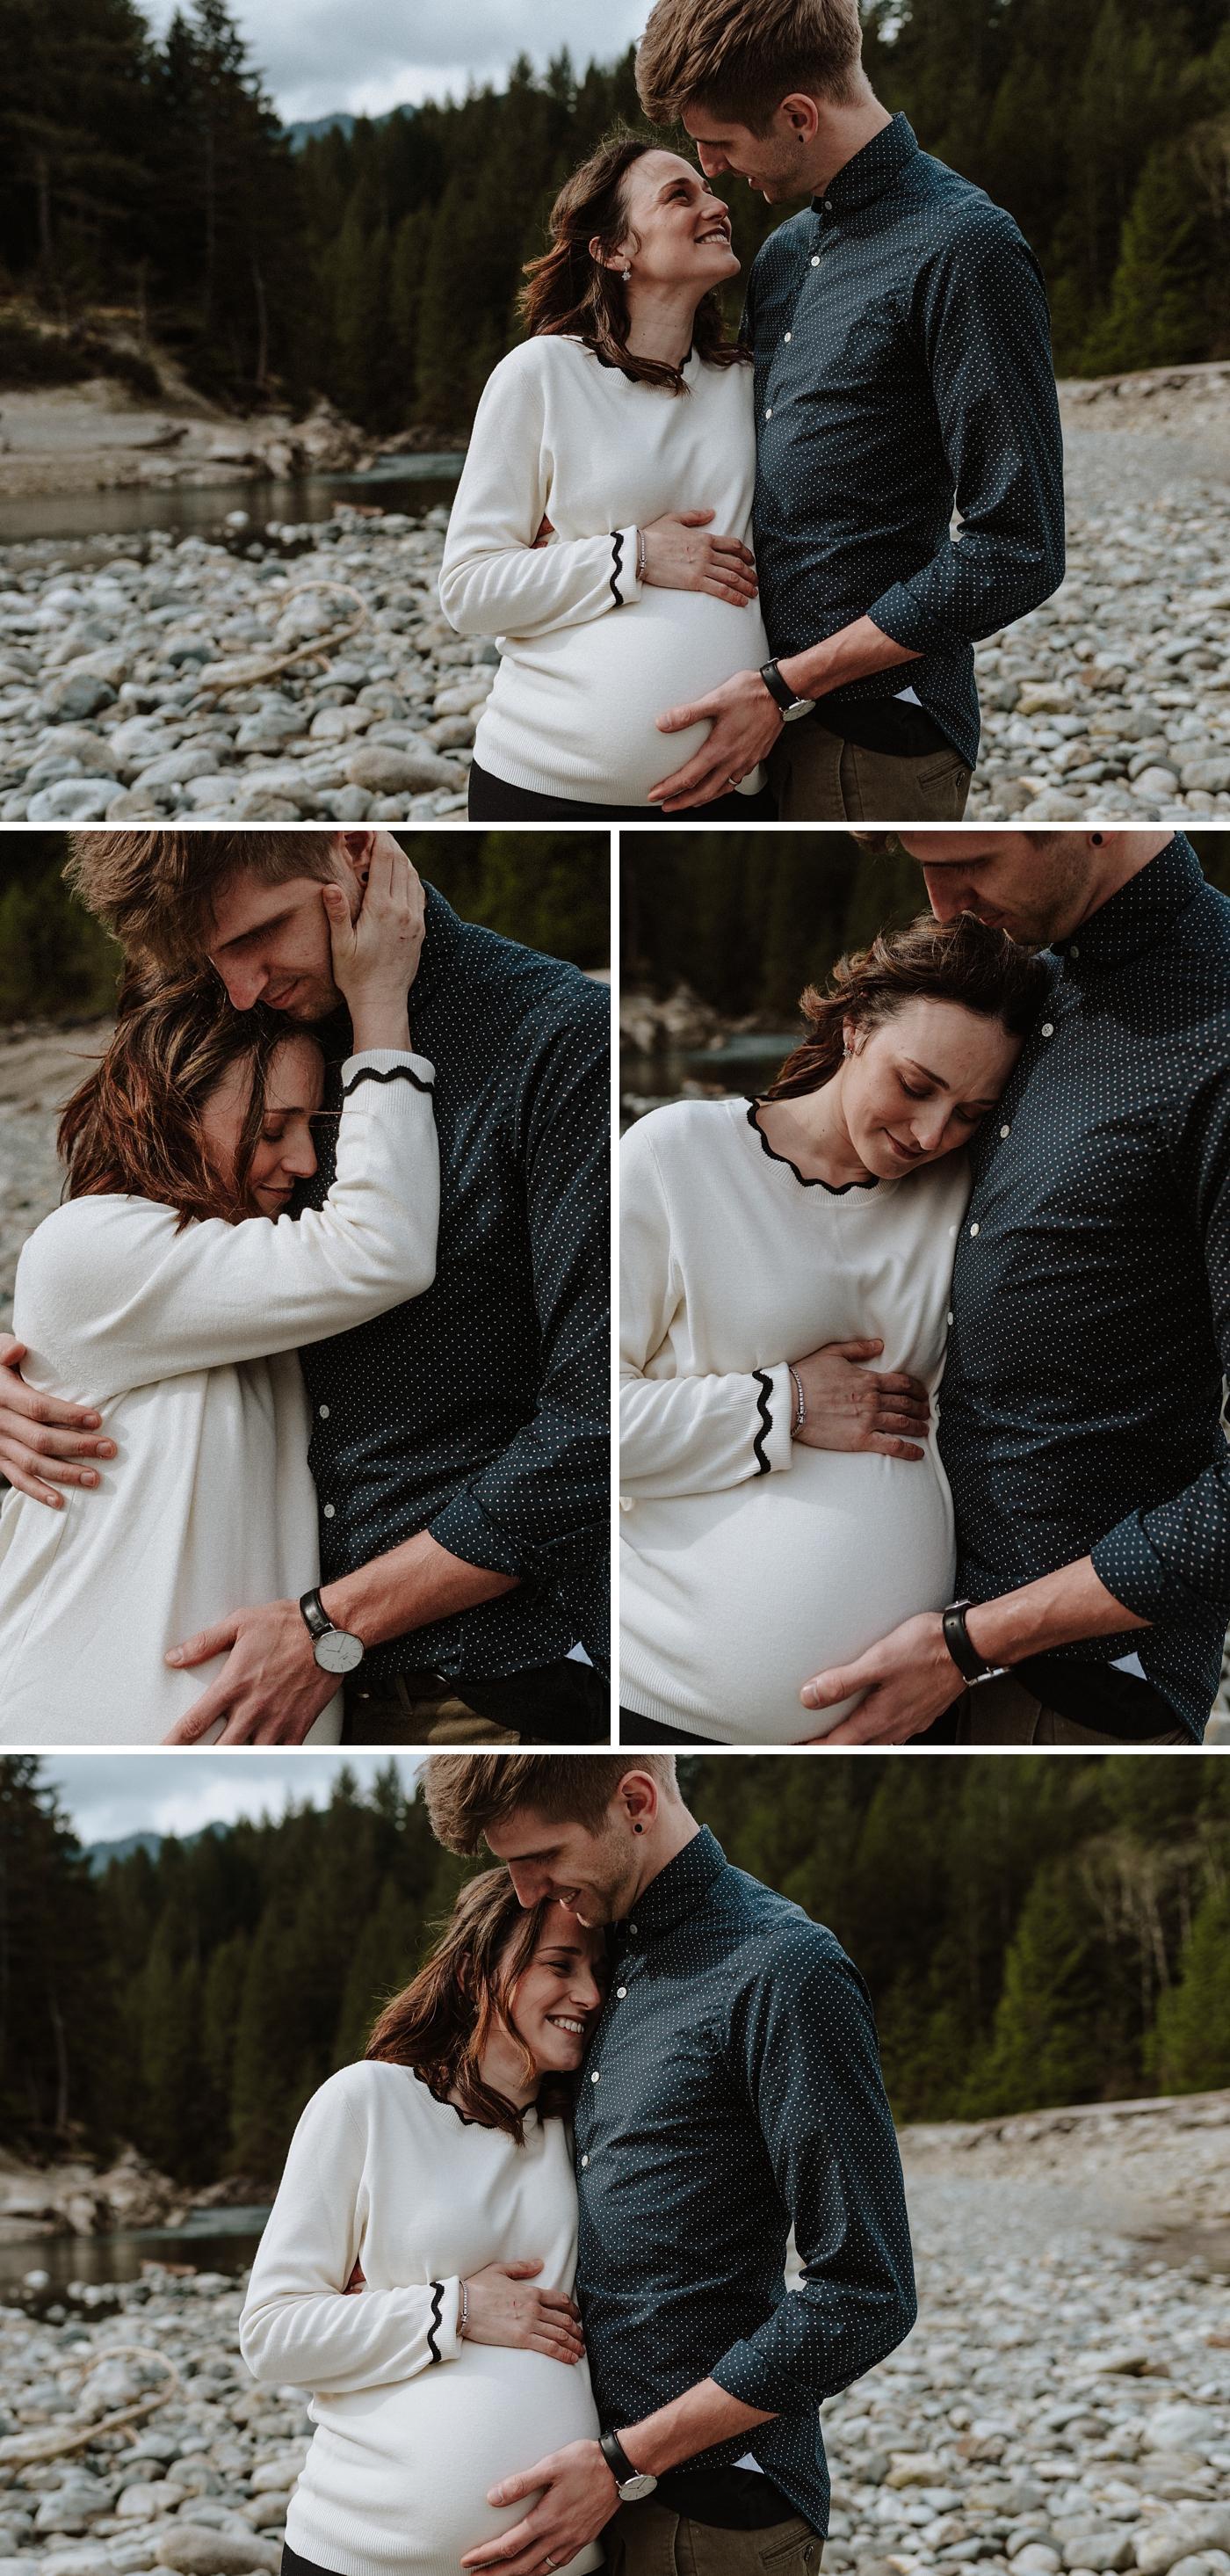 Maple-Ridge-Romantic-Wilderness-Maternity-Photography_0016.jpg